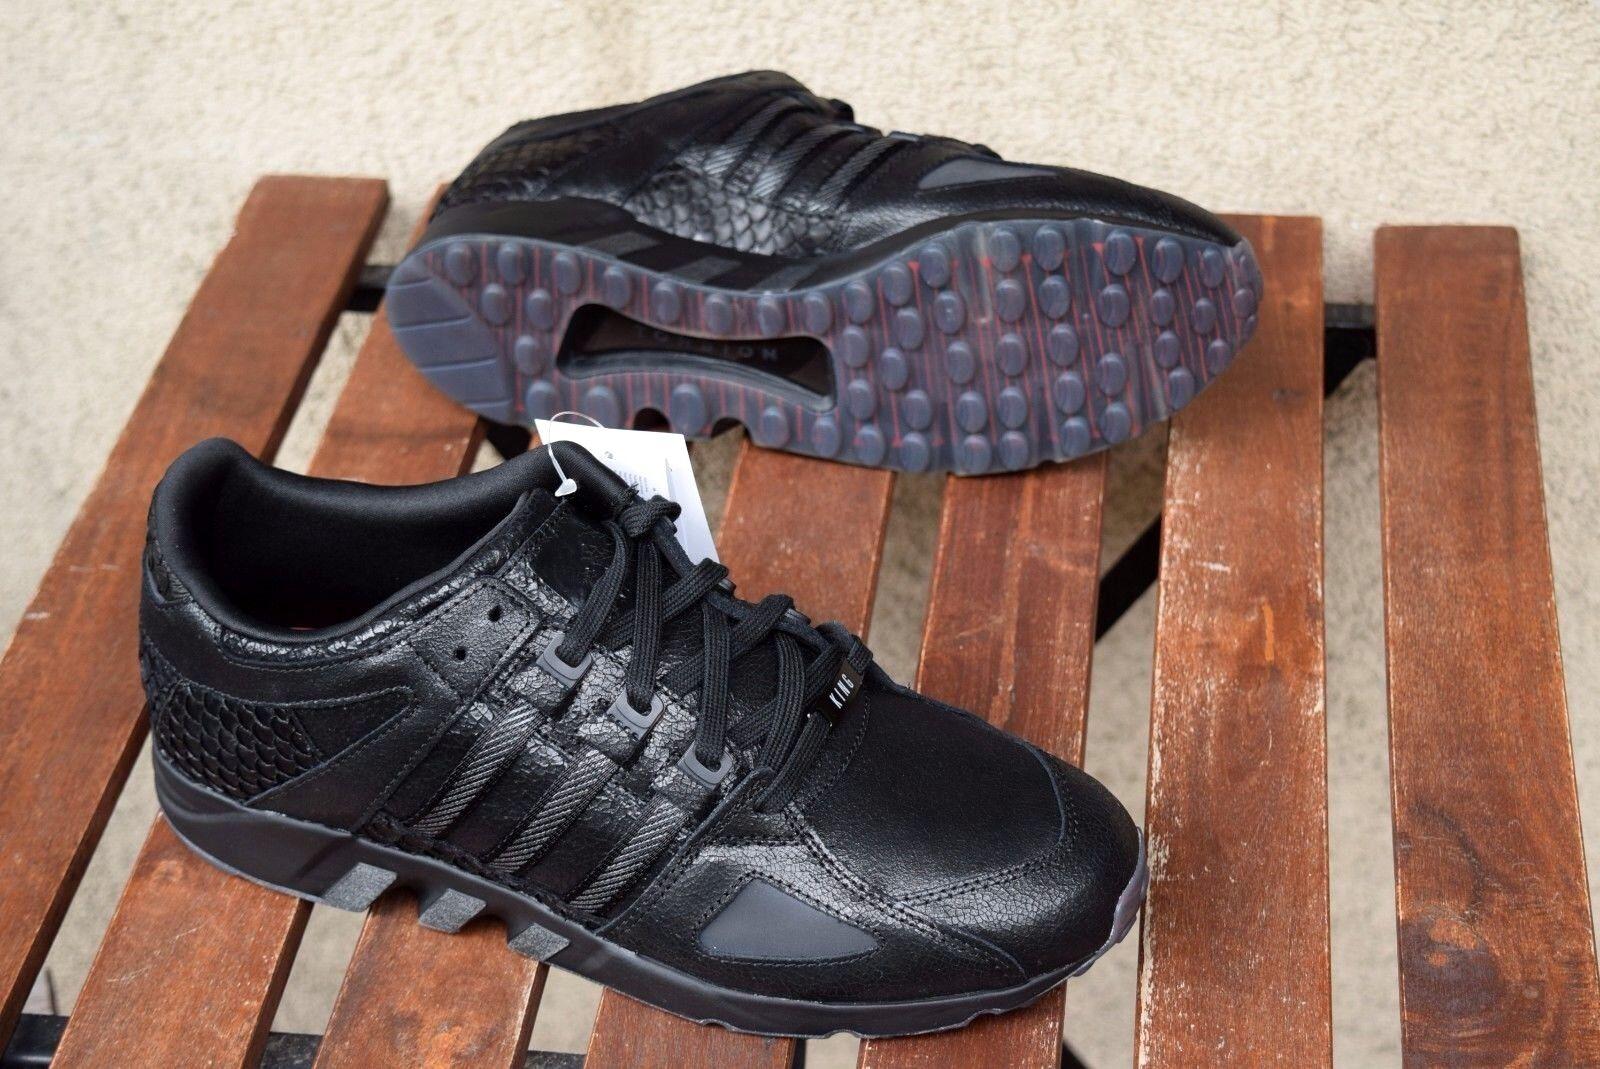 Adidas Equipment Guidance Running schwarz 48 Pusha T Tripple schwarz Running Aq7433 support 93 3057a4